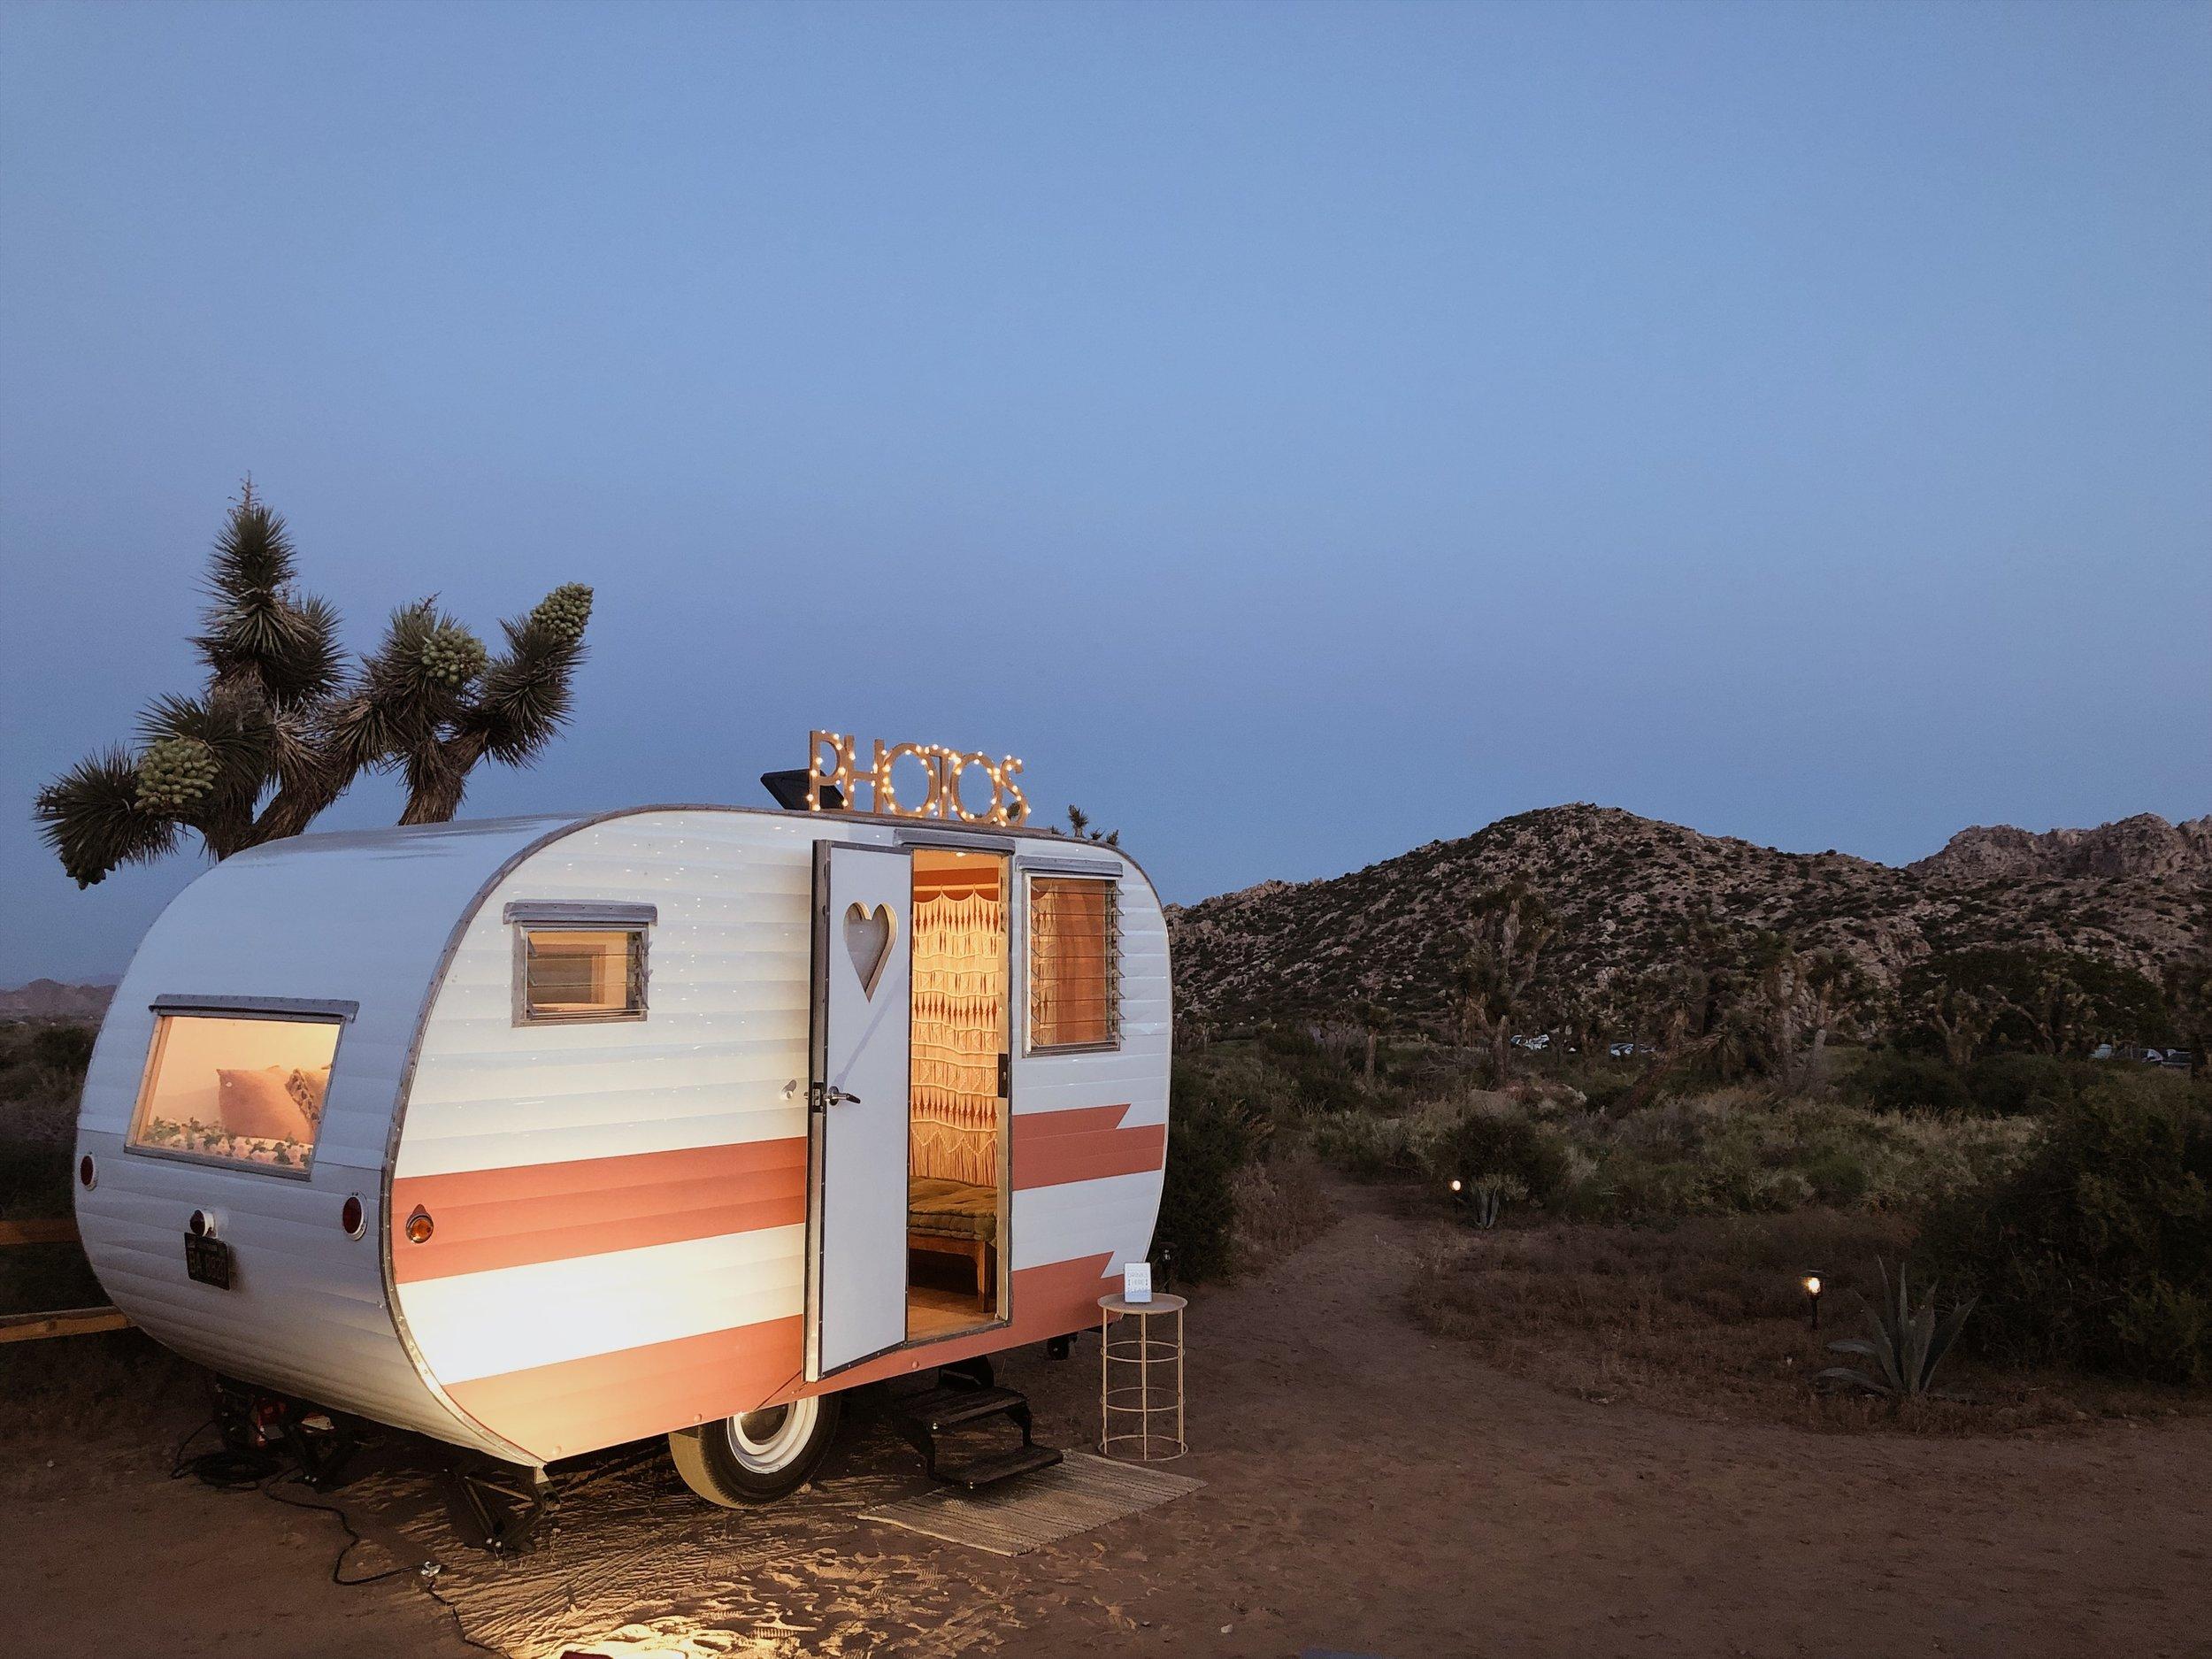 photo-booth-camper-trailer.JPG